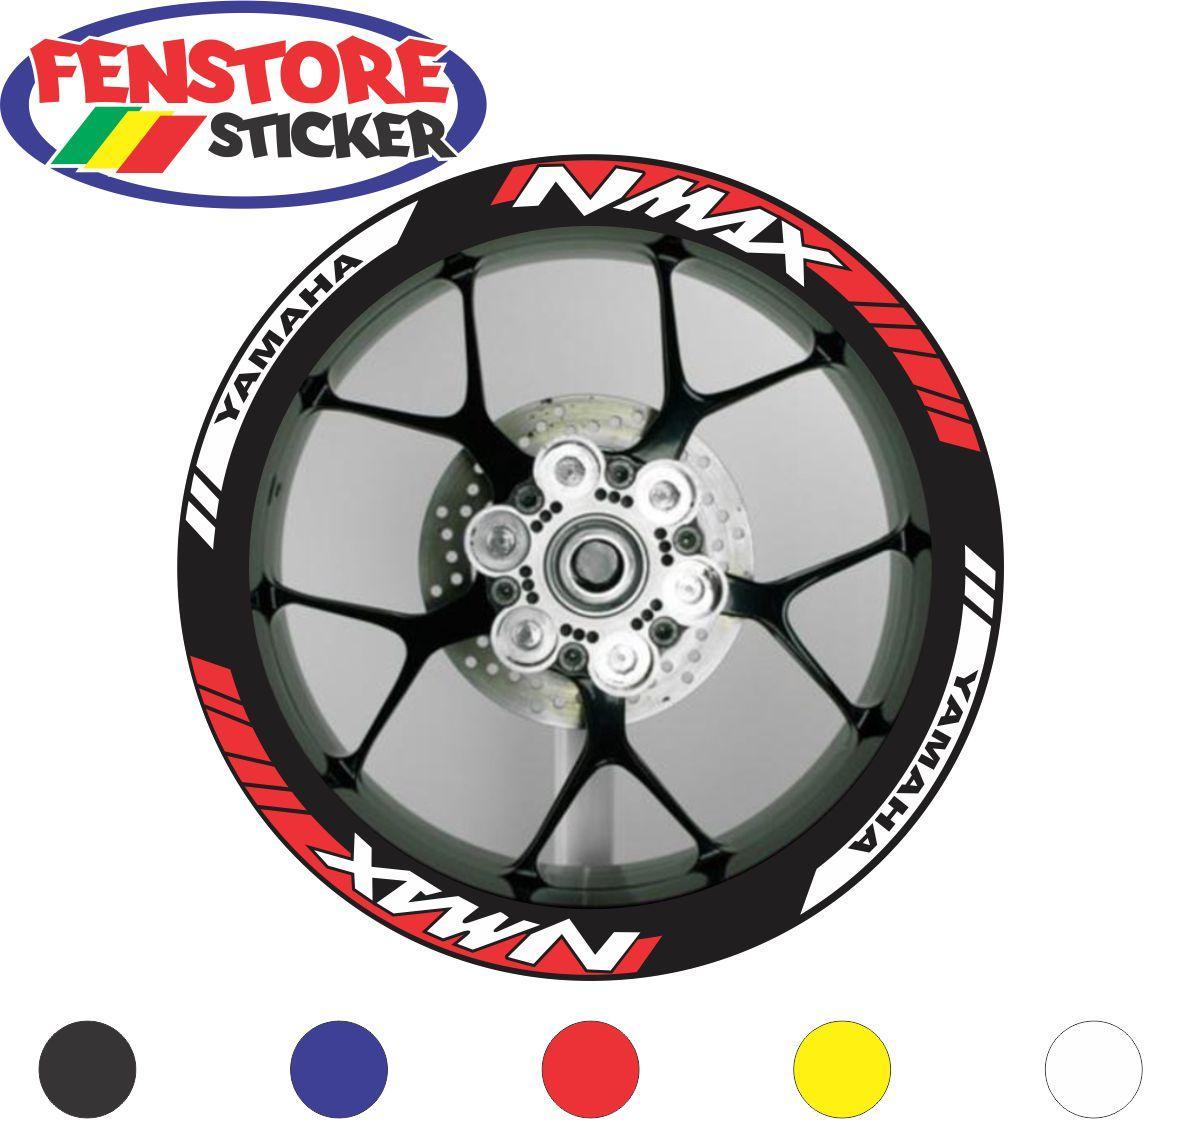 FENSTORE Sticker Cutting -  Aksesoris sticker Motor Stiker Velg Yamaha Nmax 8 MR  -  FENSTORE sticker